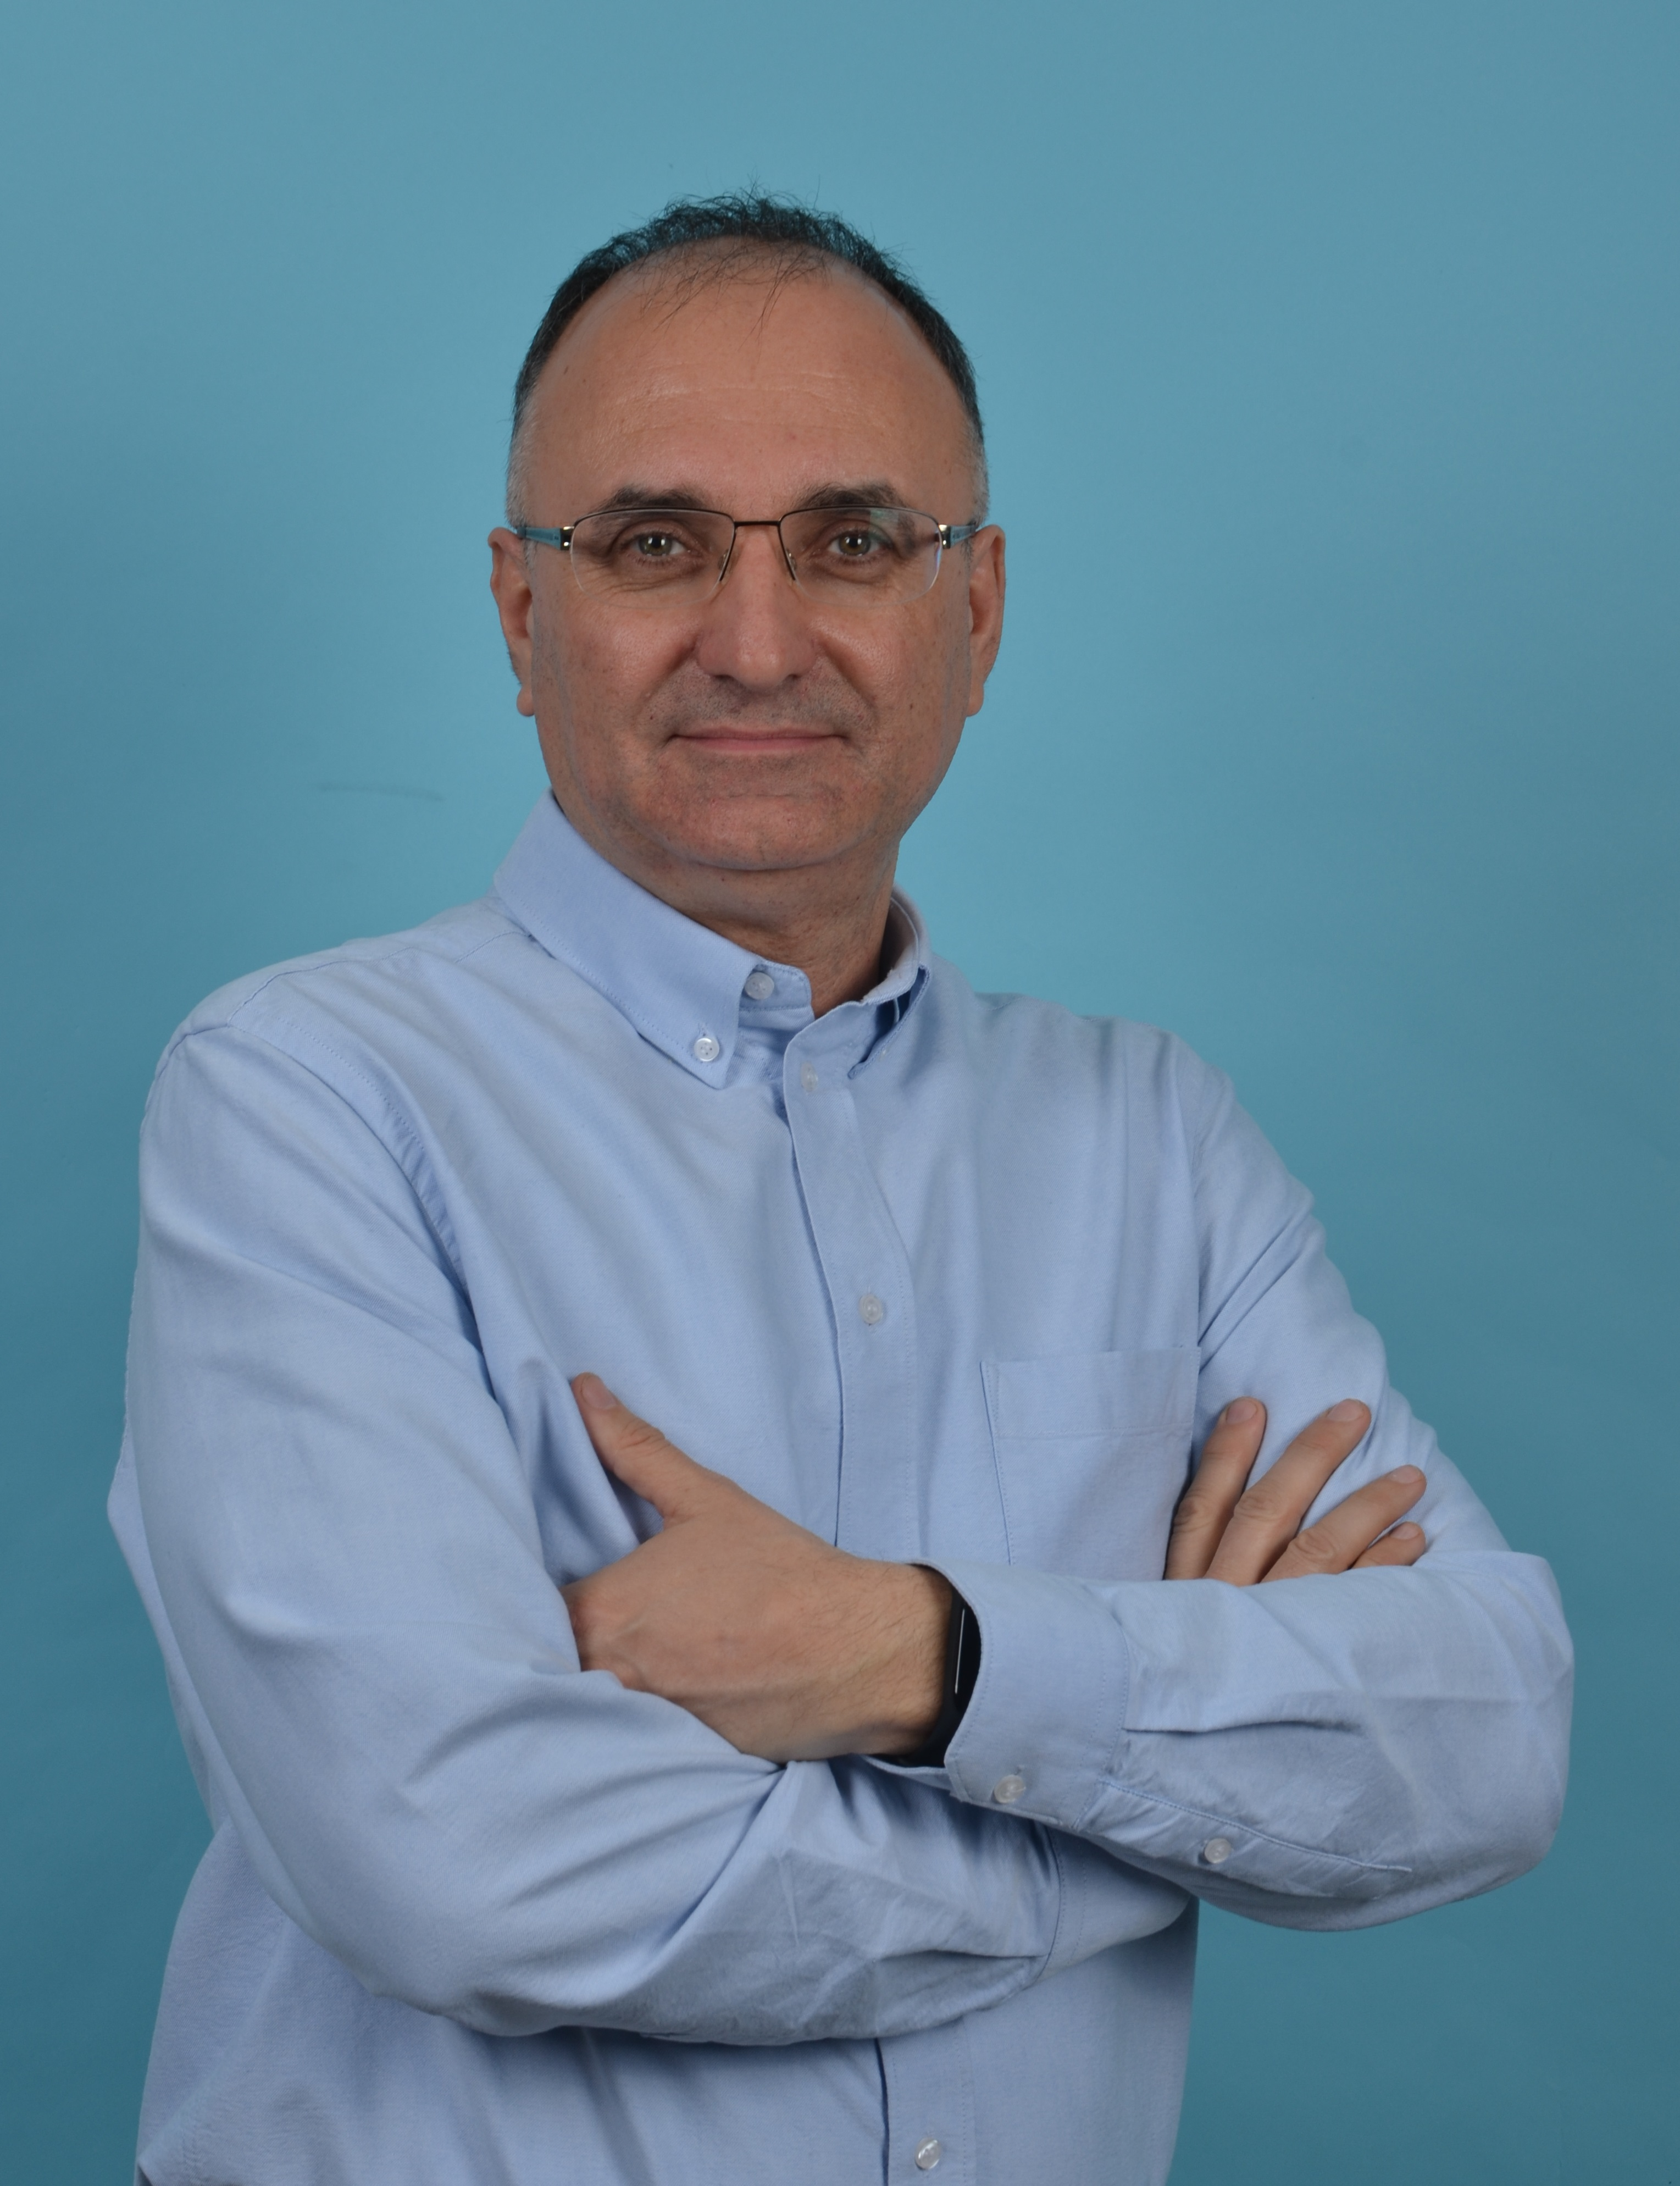 http://www.uaib.com.ua/img/forall/pisnyi.jpg